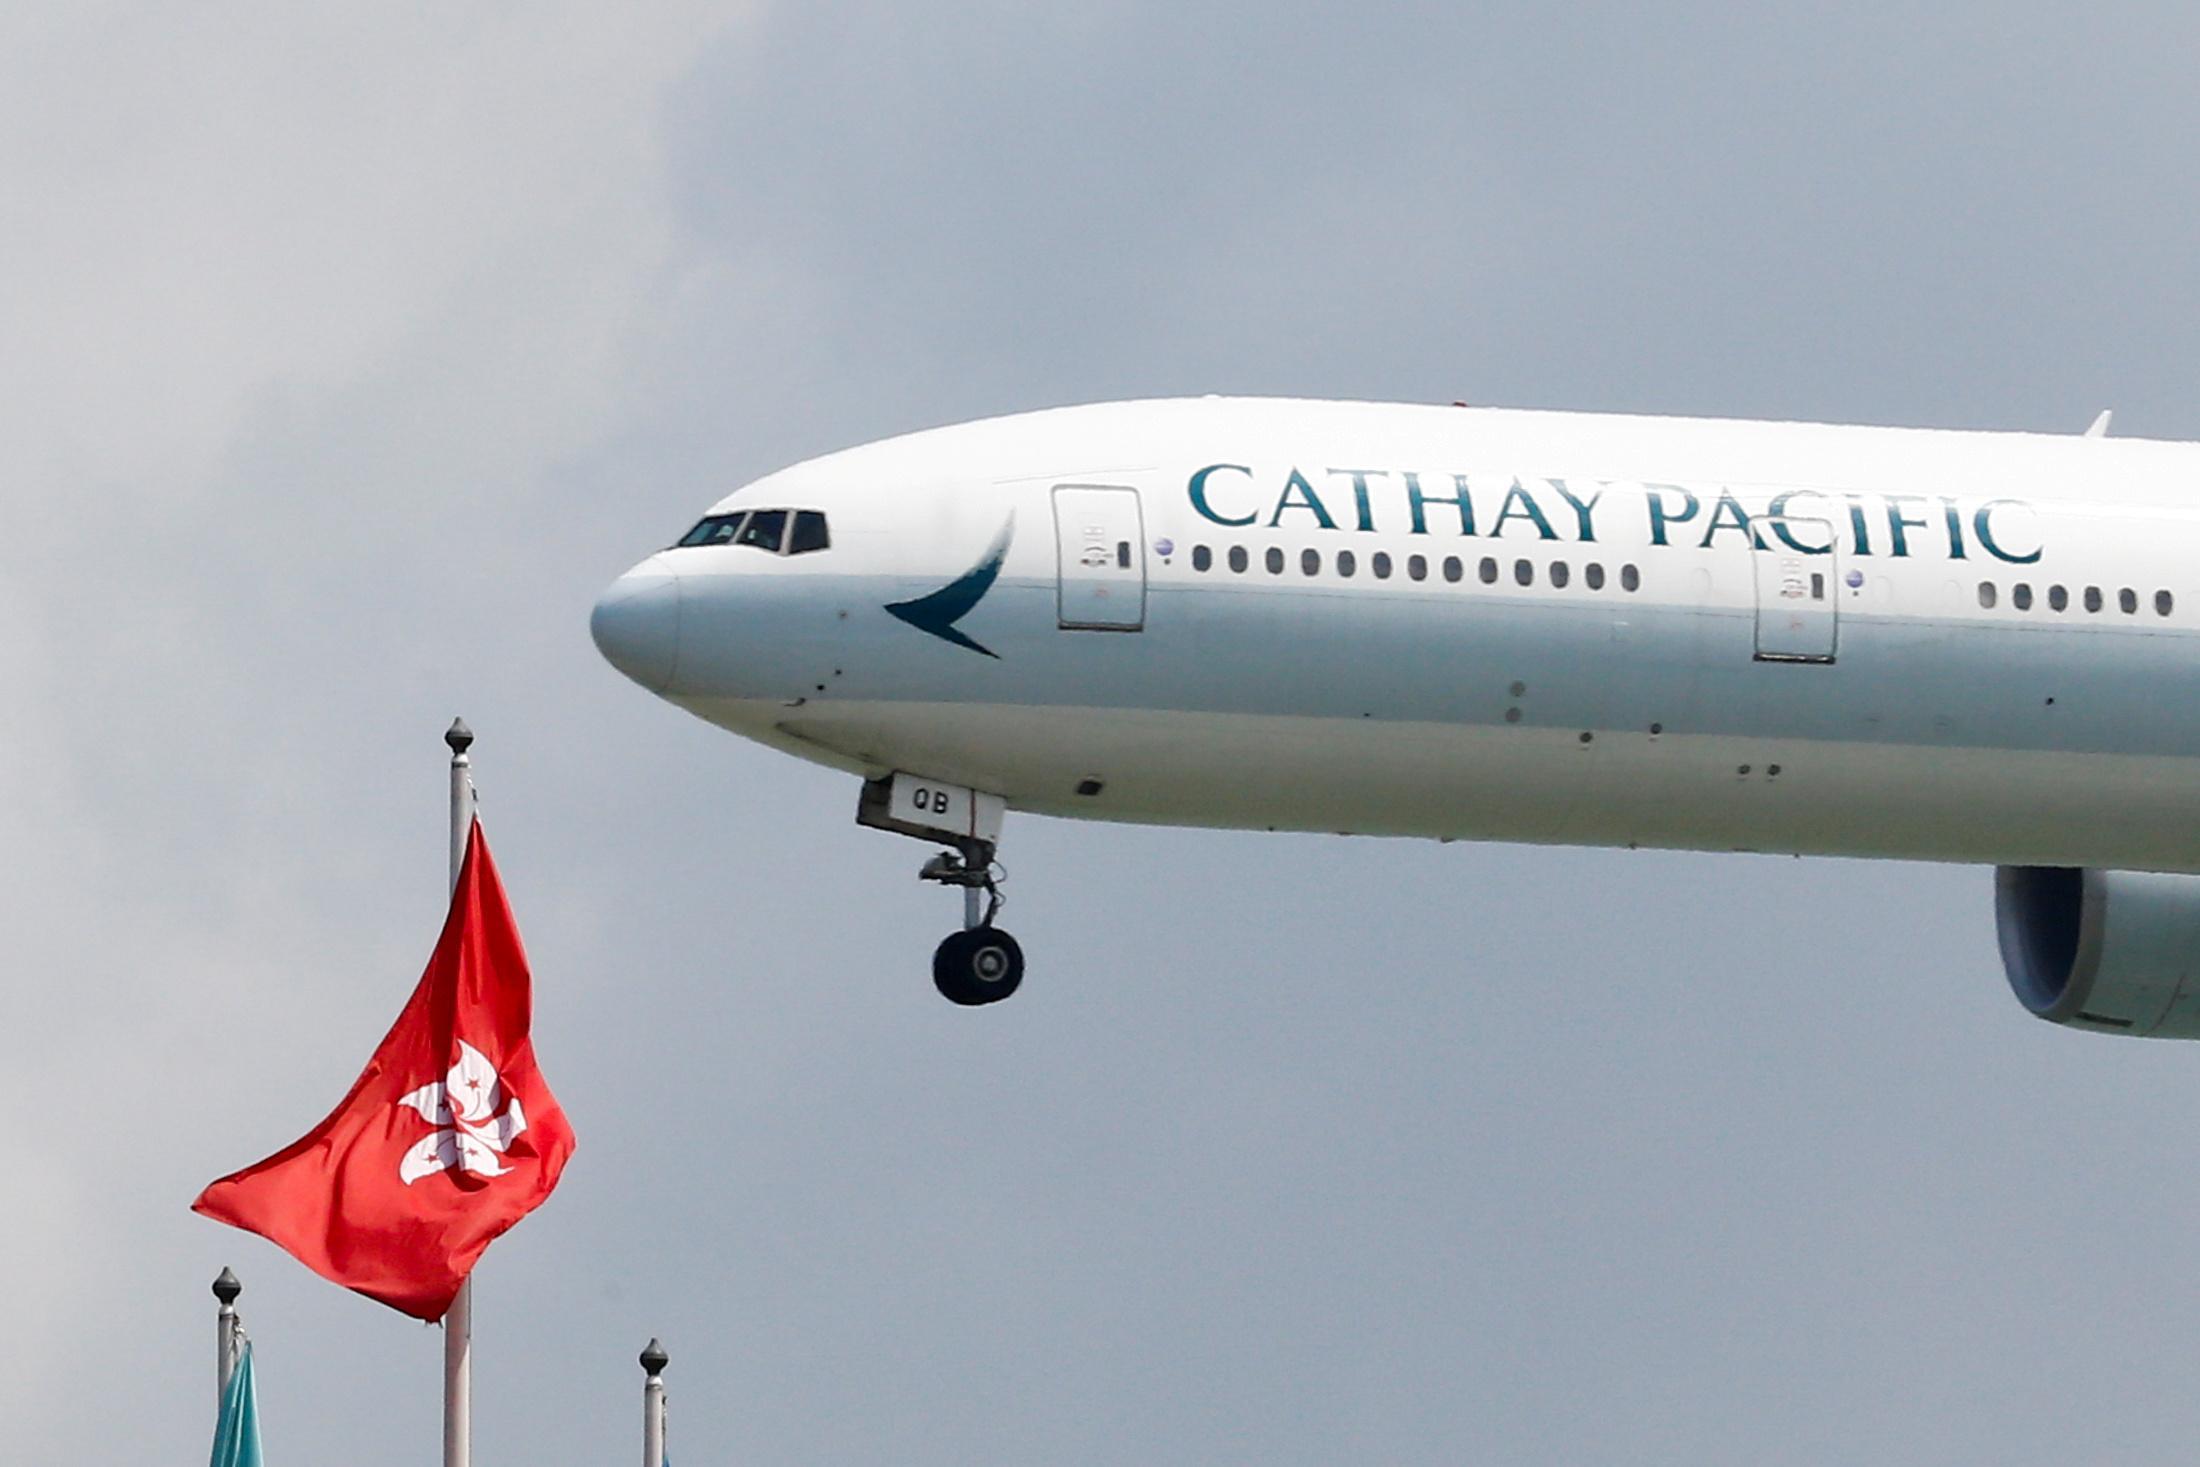 Cathay Pacific shelves U.S. dollar bond plans amid Hong Kong unrest